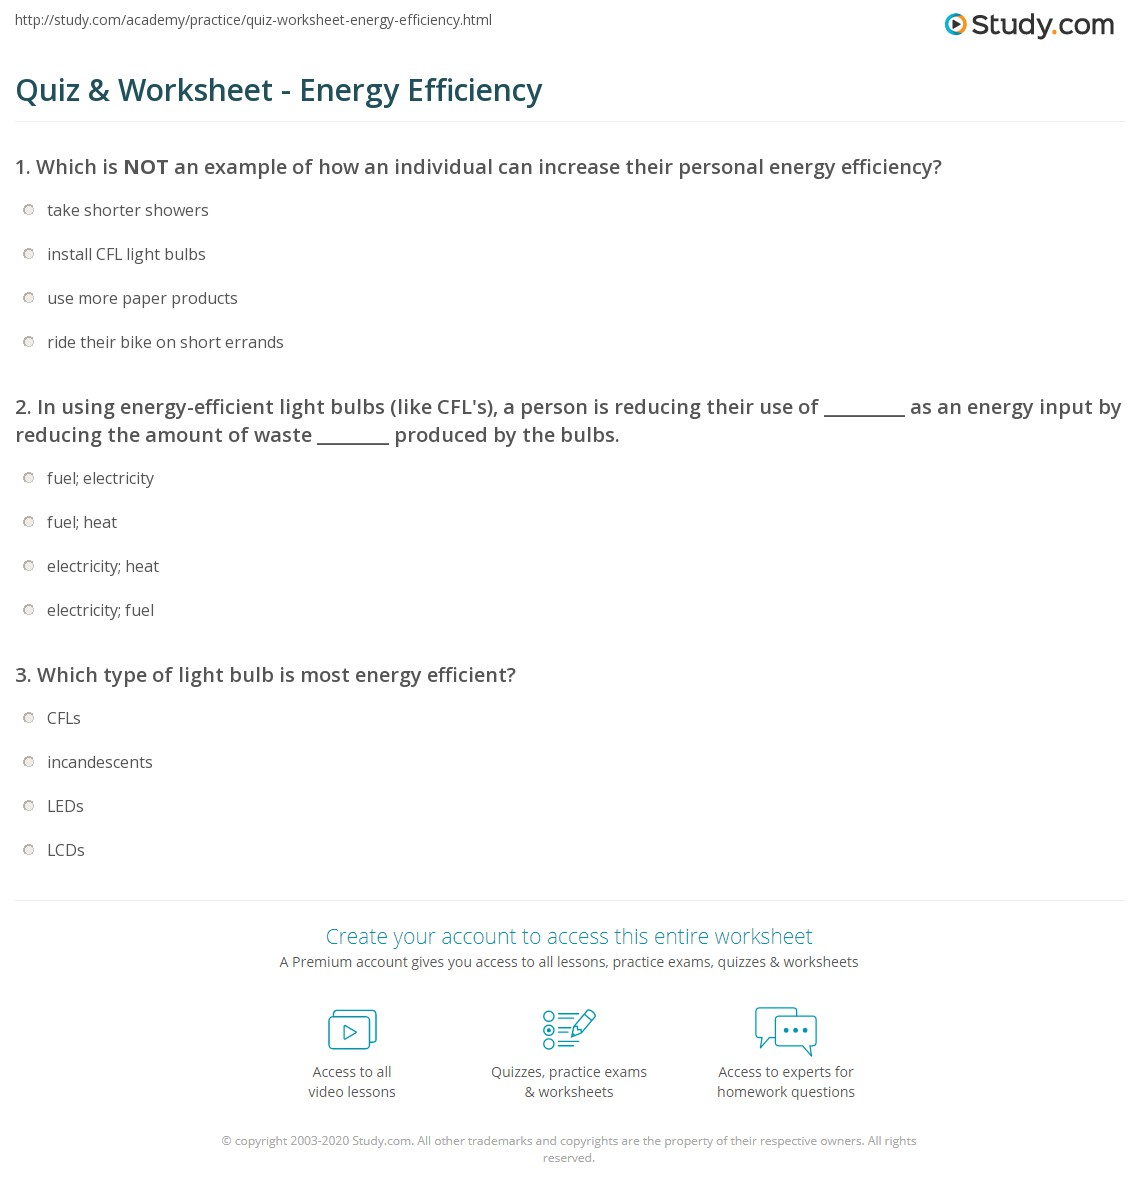 Quiz & Worksheet - Energy Efficiency | Study.com